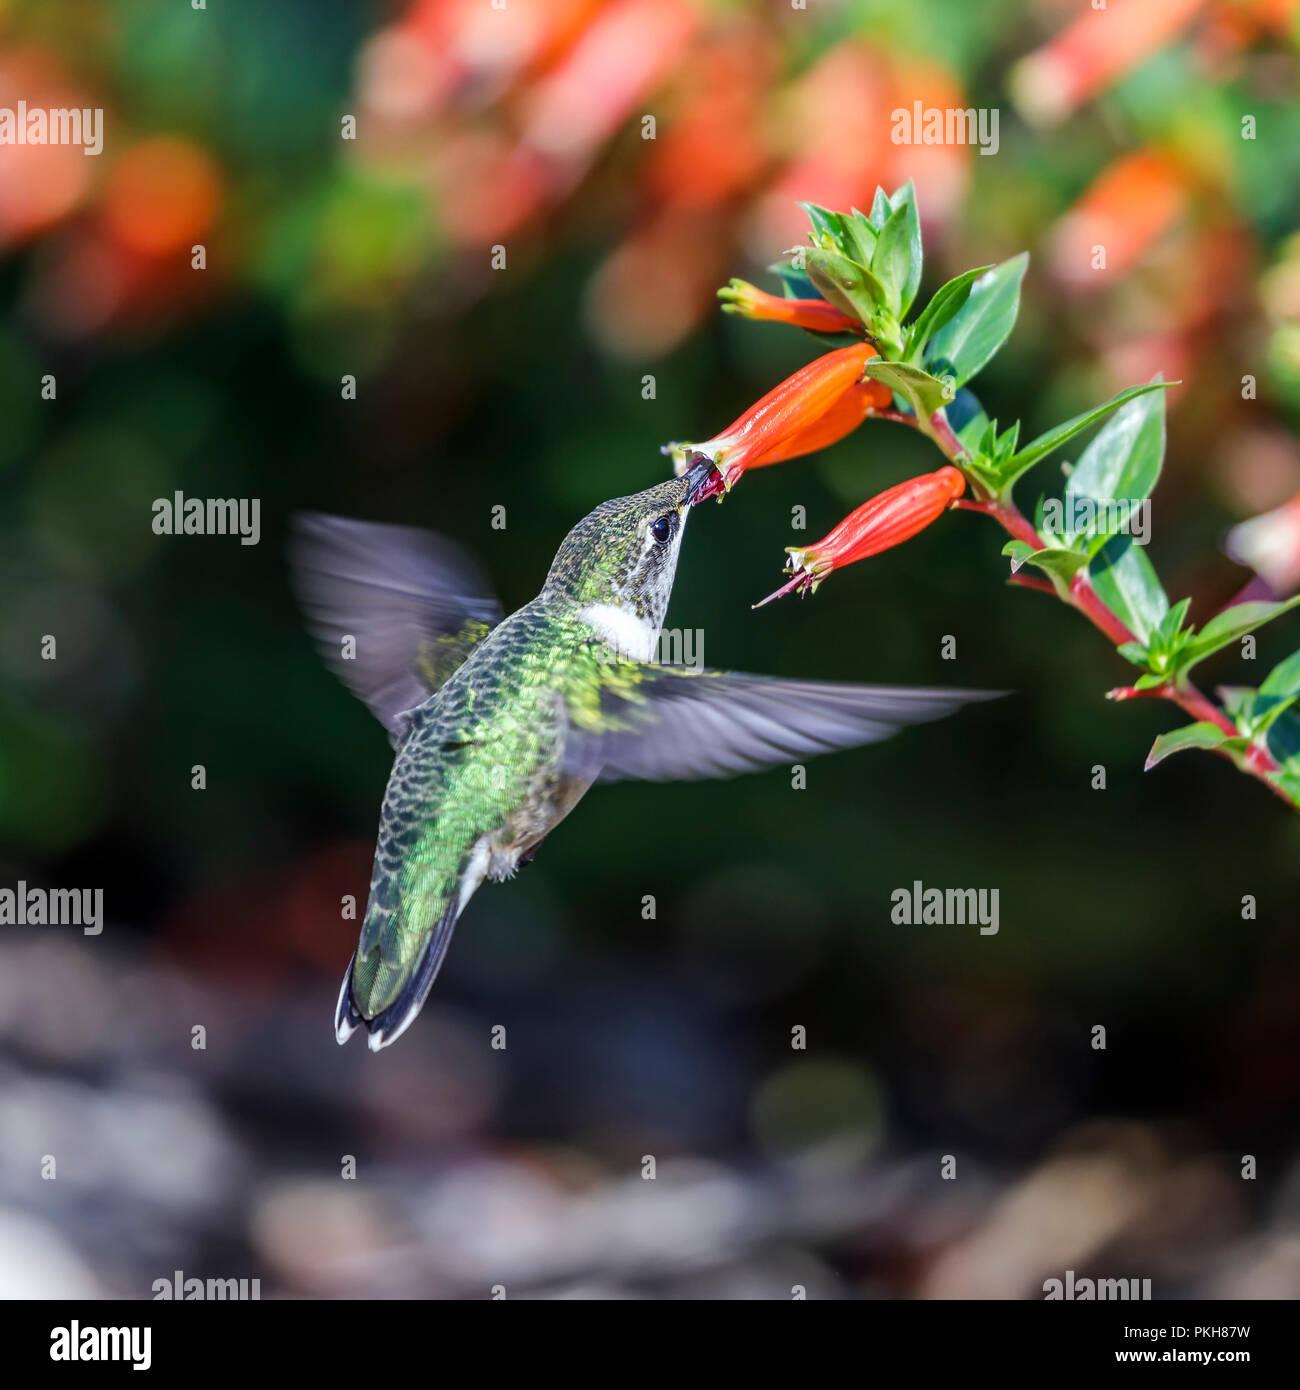 Ruby-throated hummingbird (Archilochus colubris), female, feeding on Mexican Cigar Plant, Cuphea, Manitoba, Canada. - Stock Image